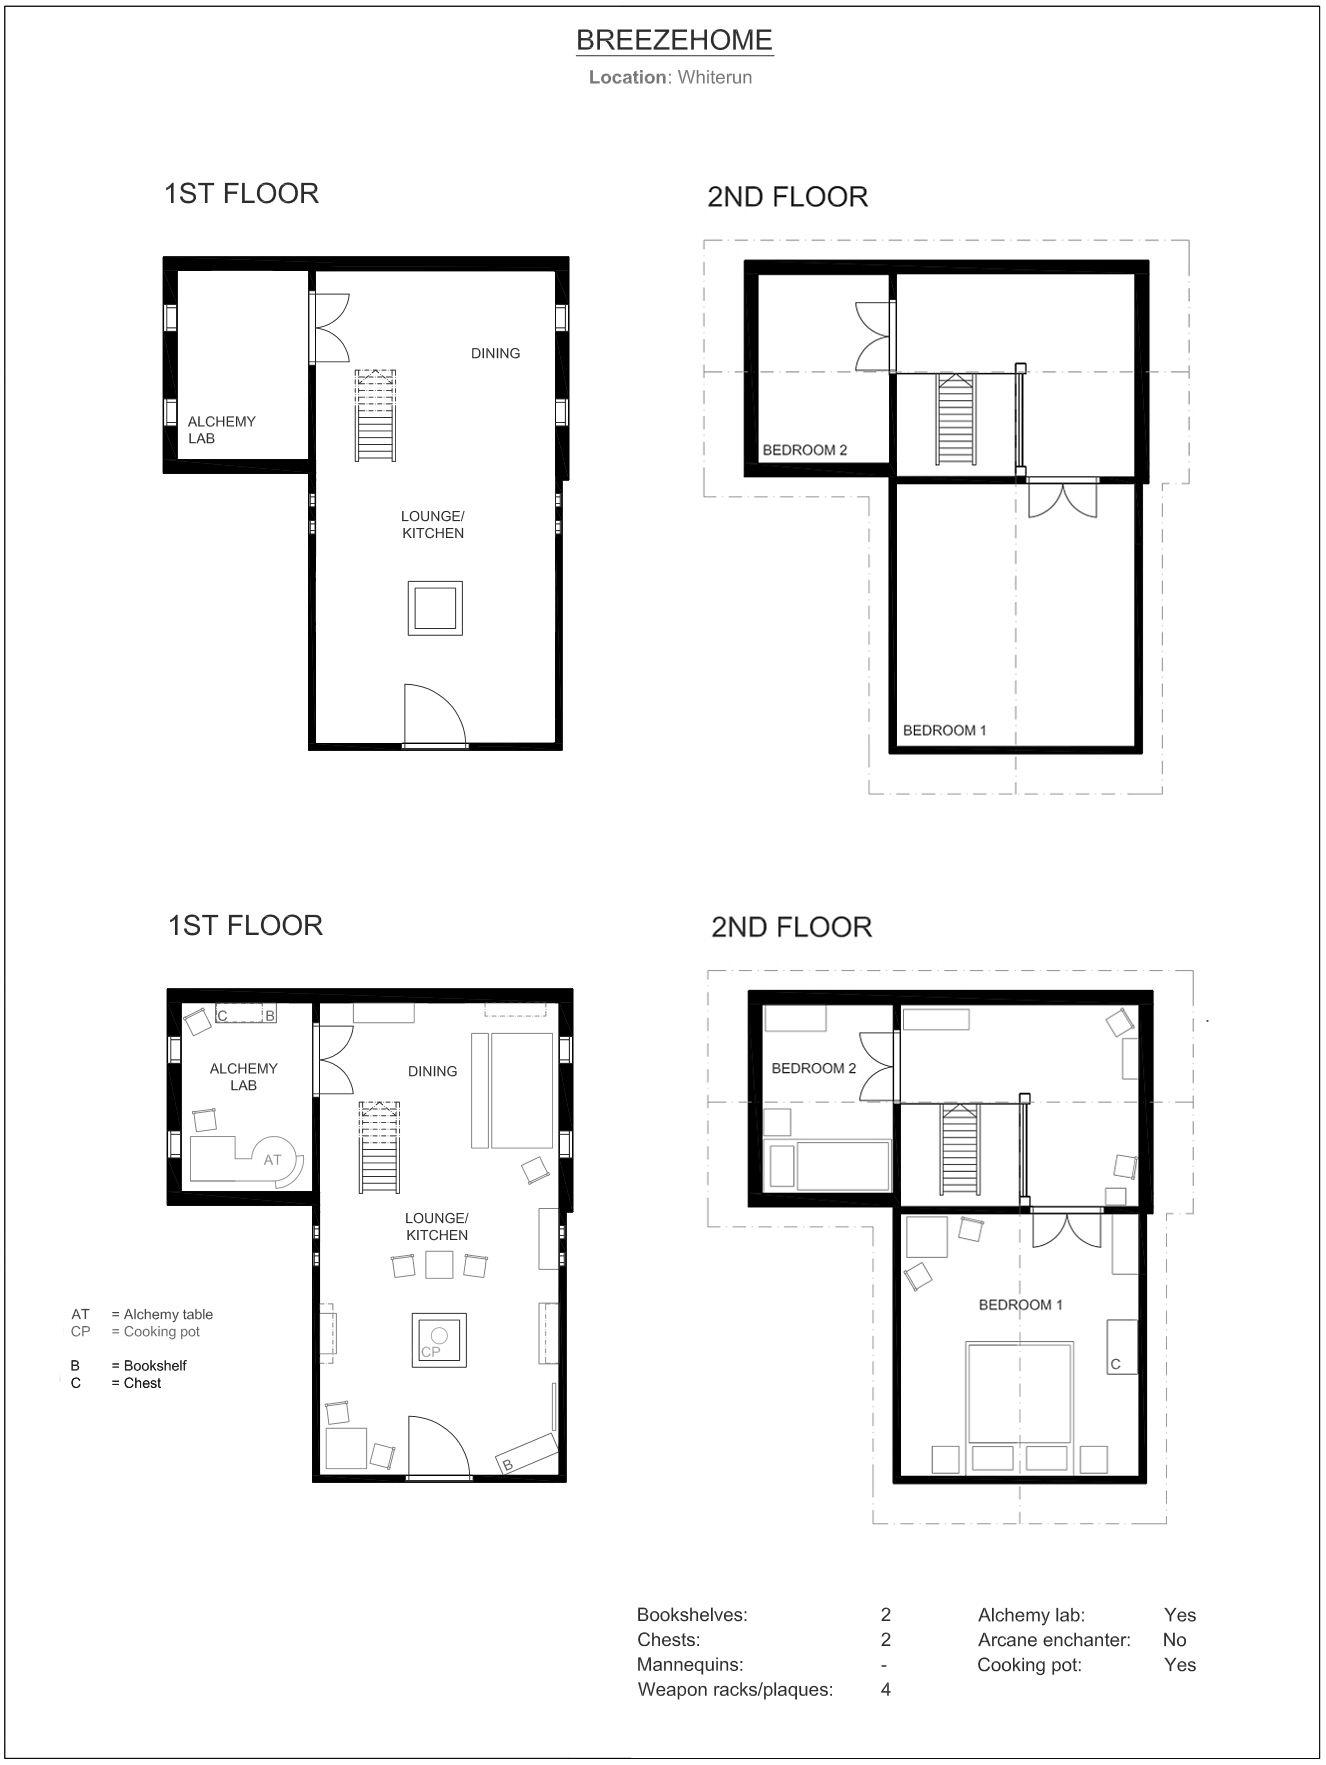 Breezehome floor plan Skyrim by neonspider on DeviantArt